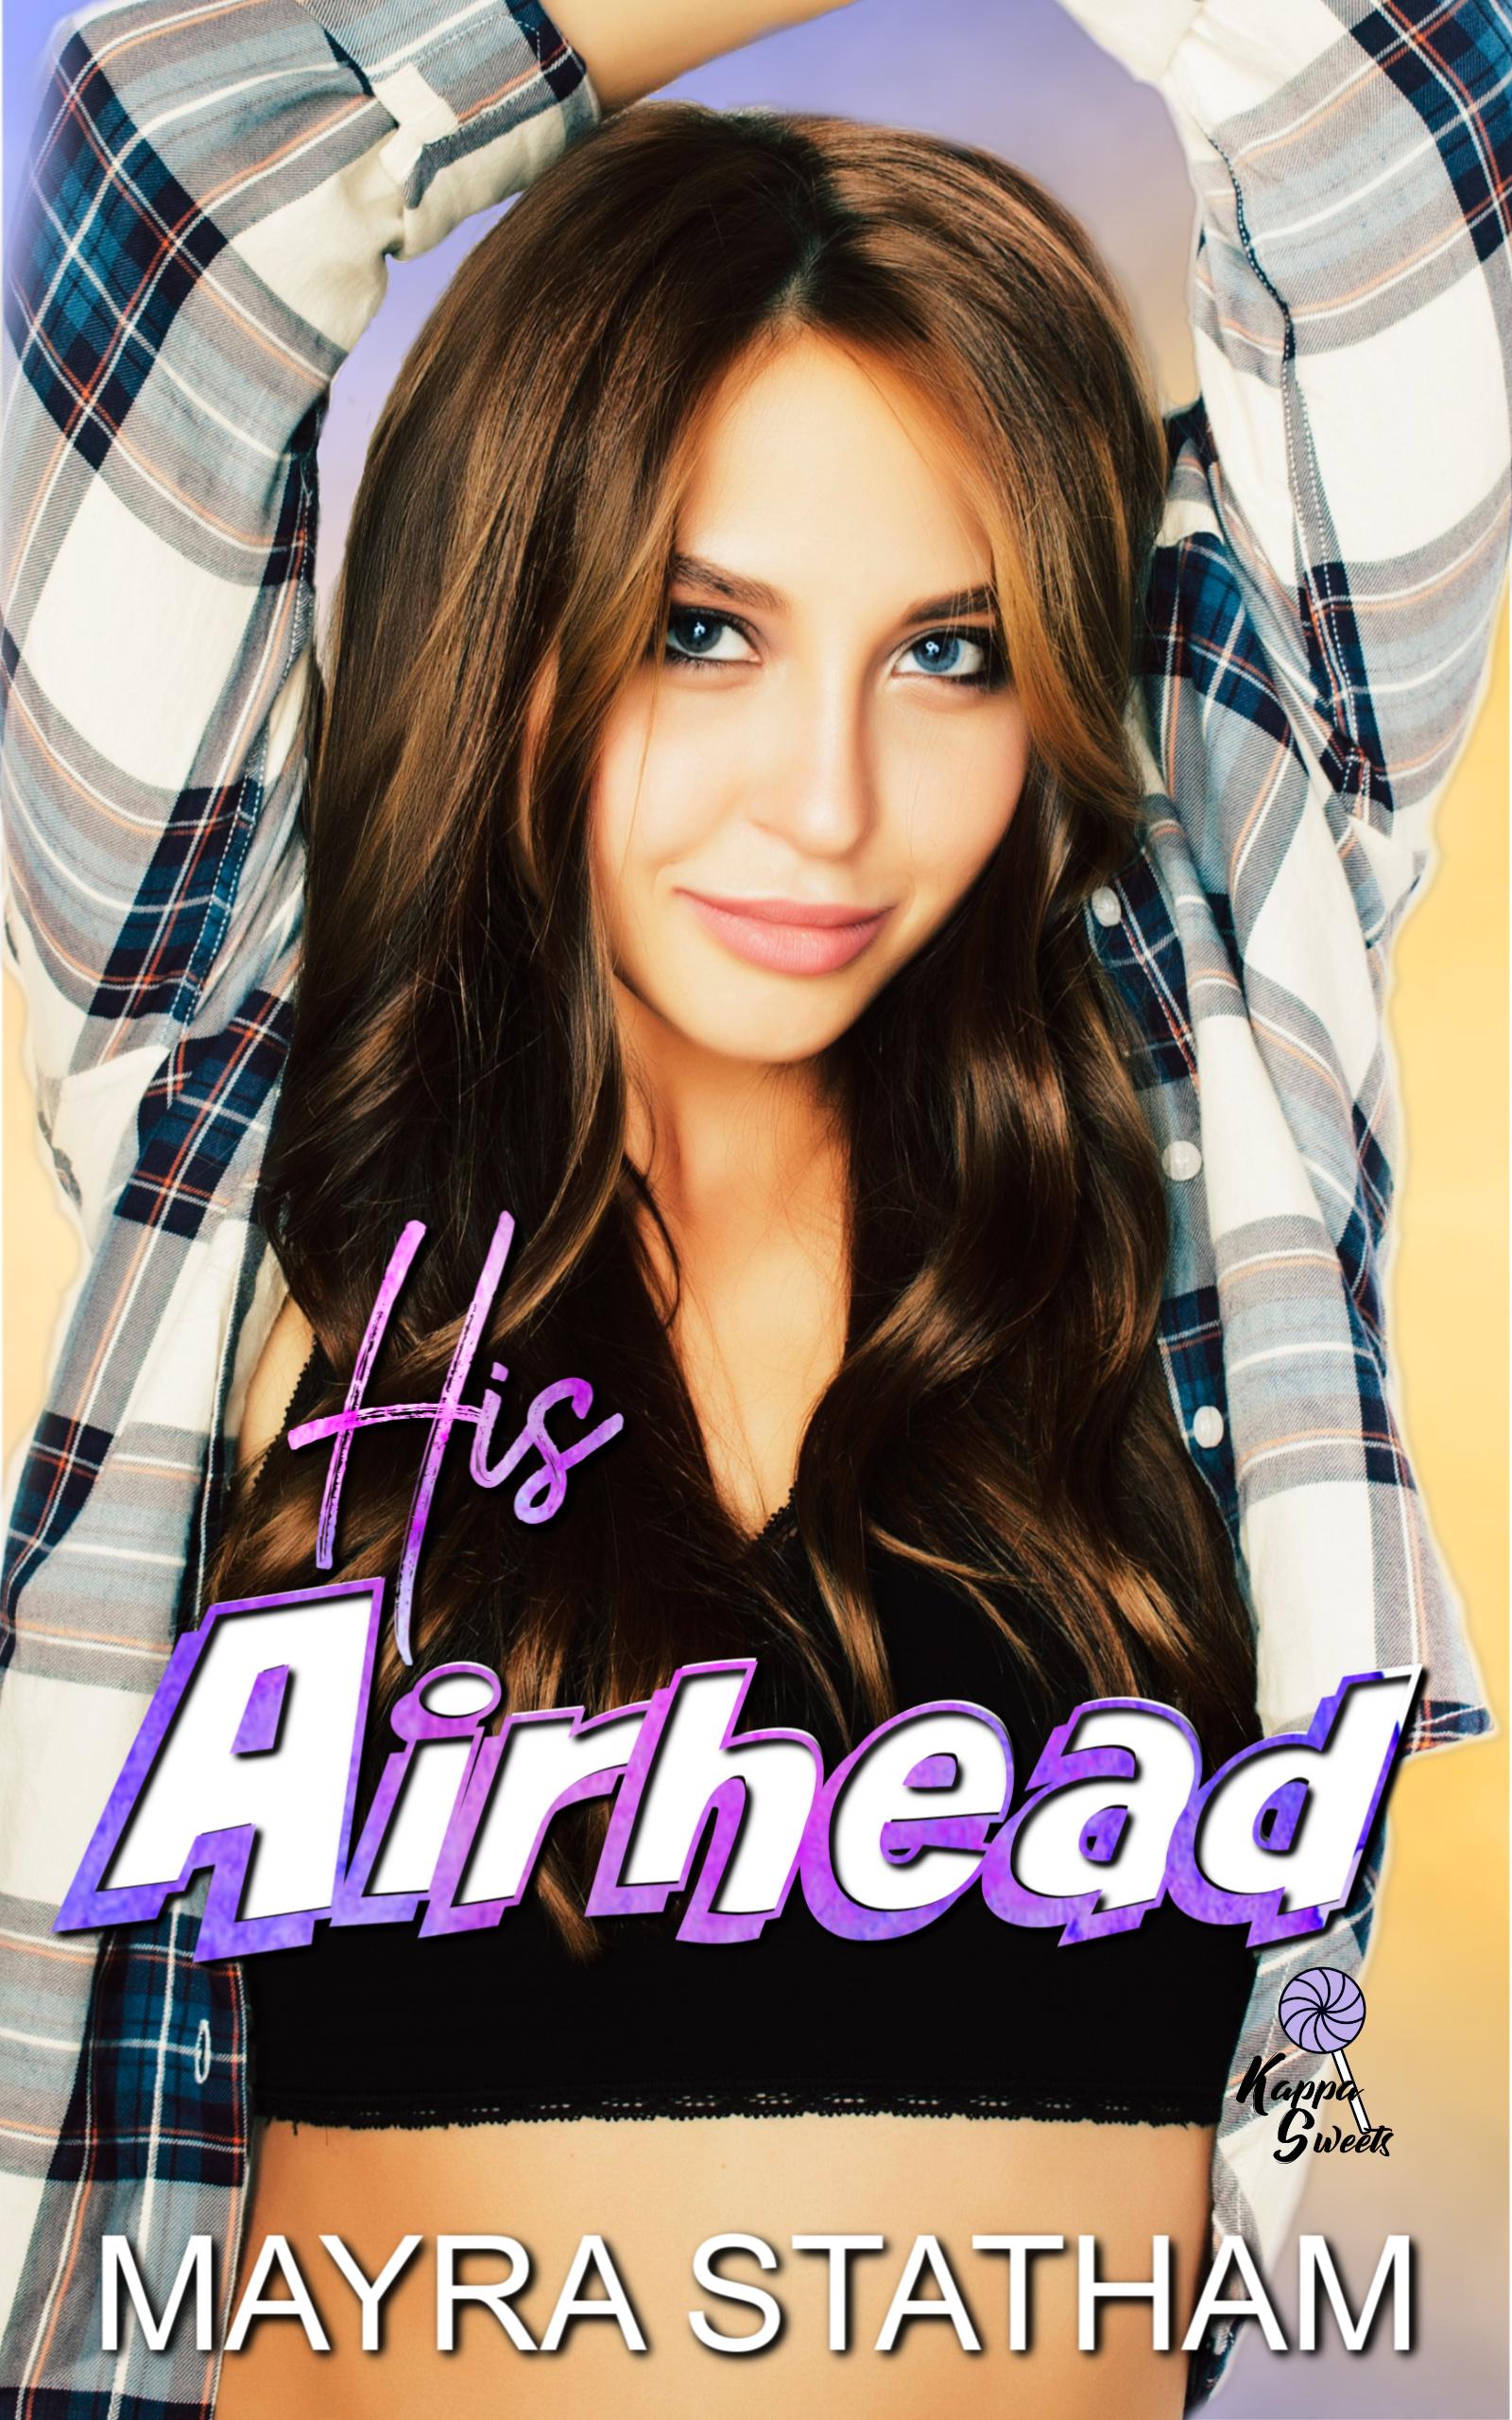 His Airhead (Kappa Sweets Series #3)